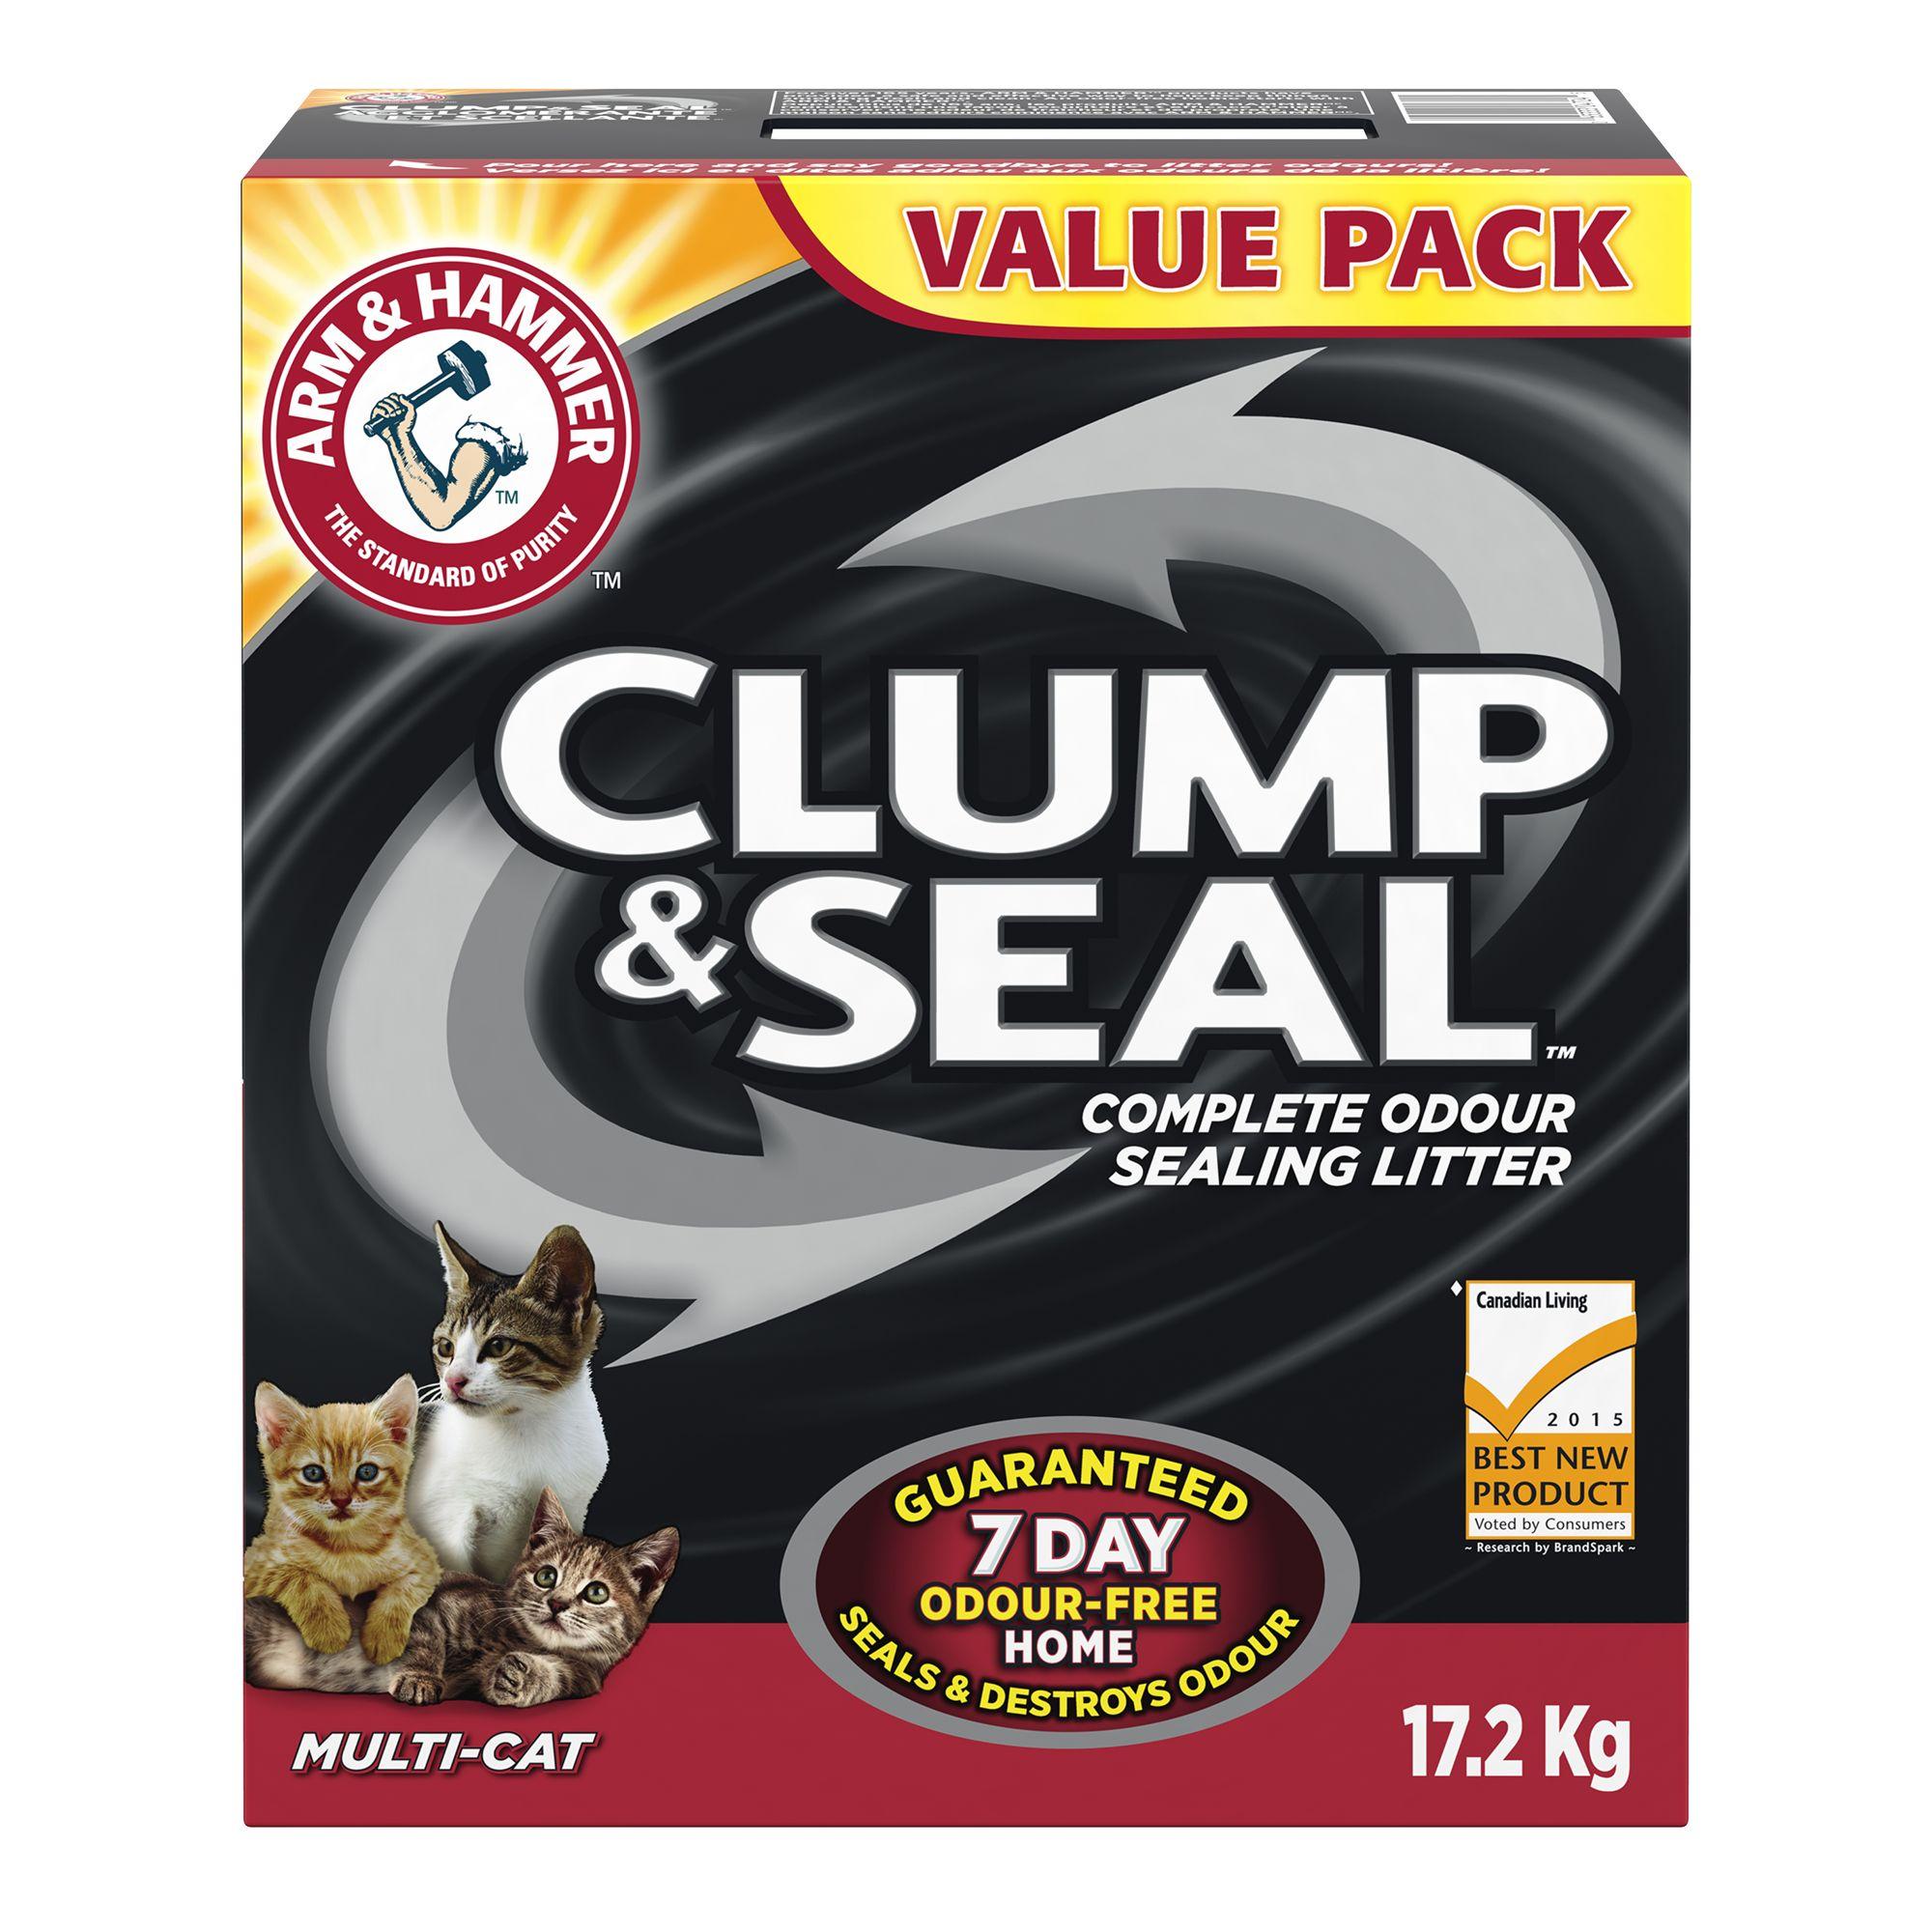 Arm & Hammer Clump & Seal Cat Litter - Clumping, Multi-Cat